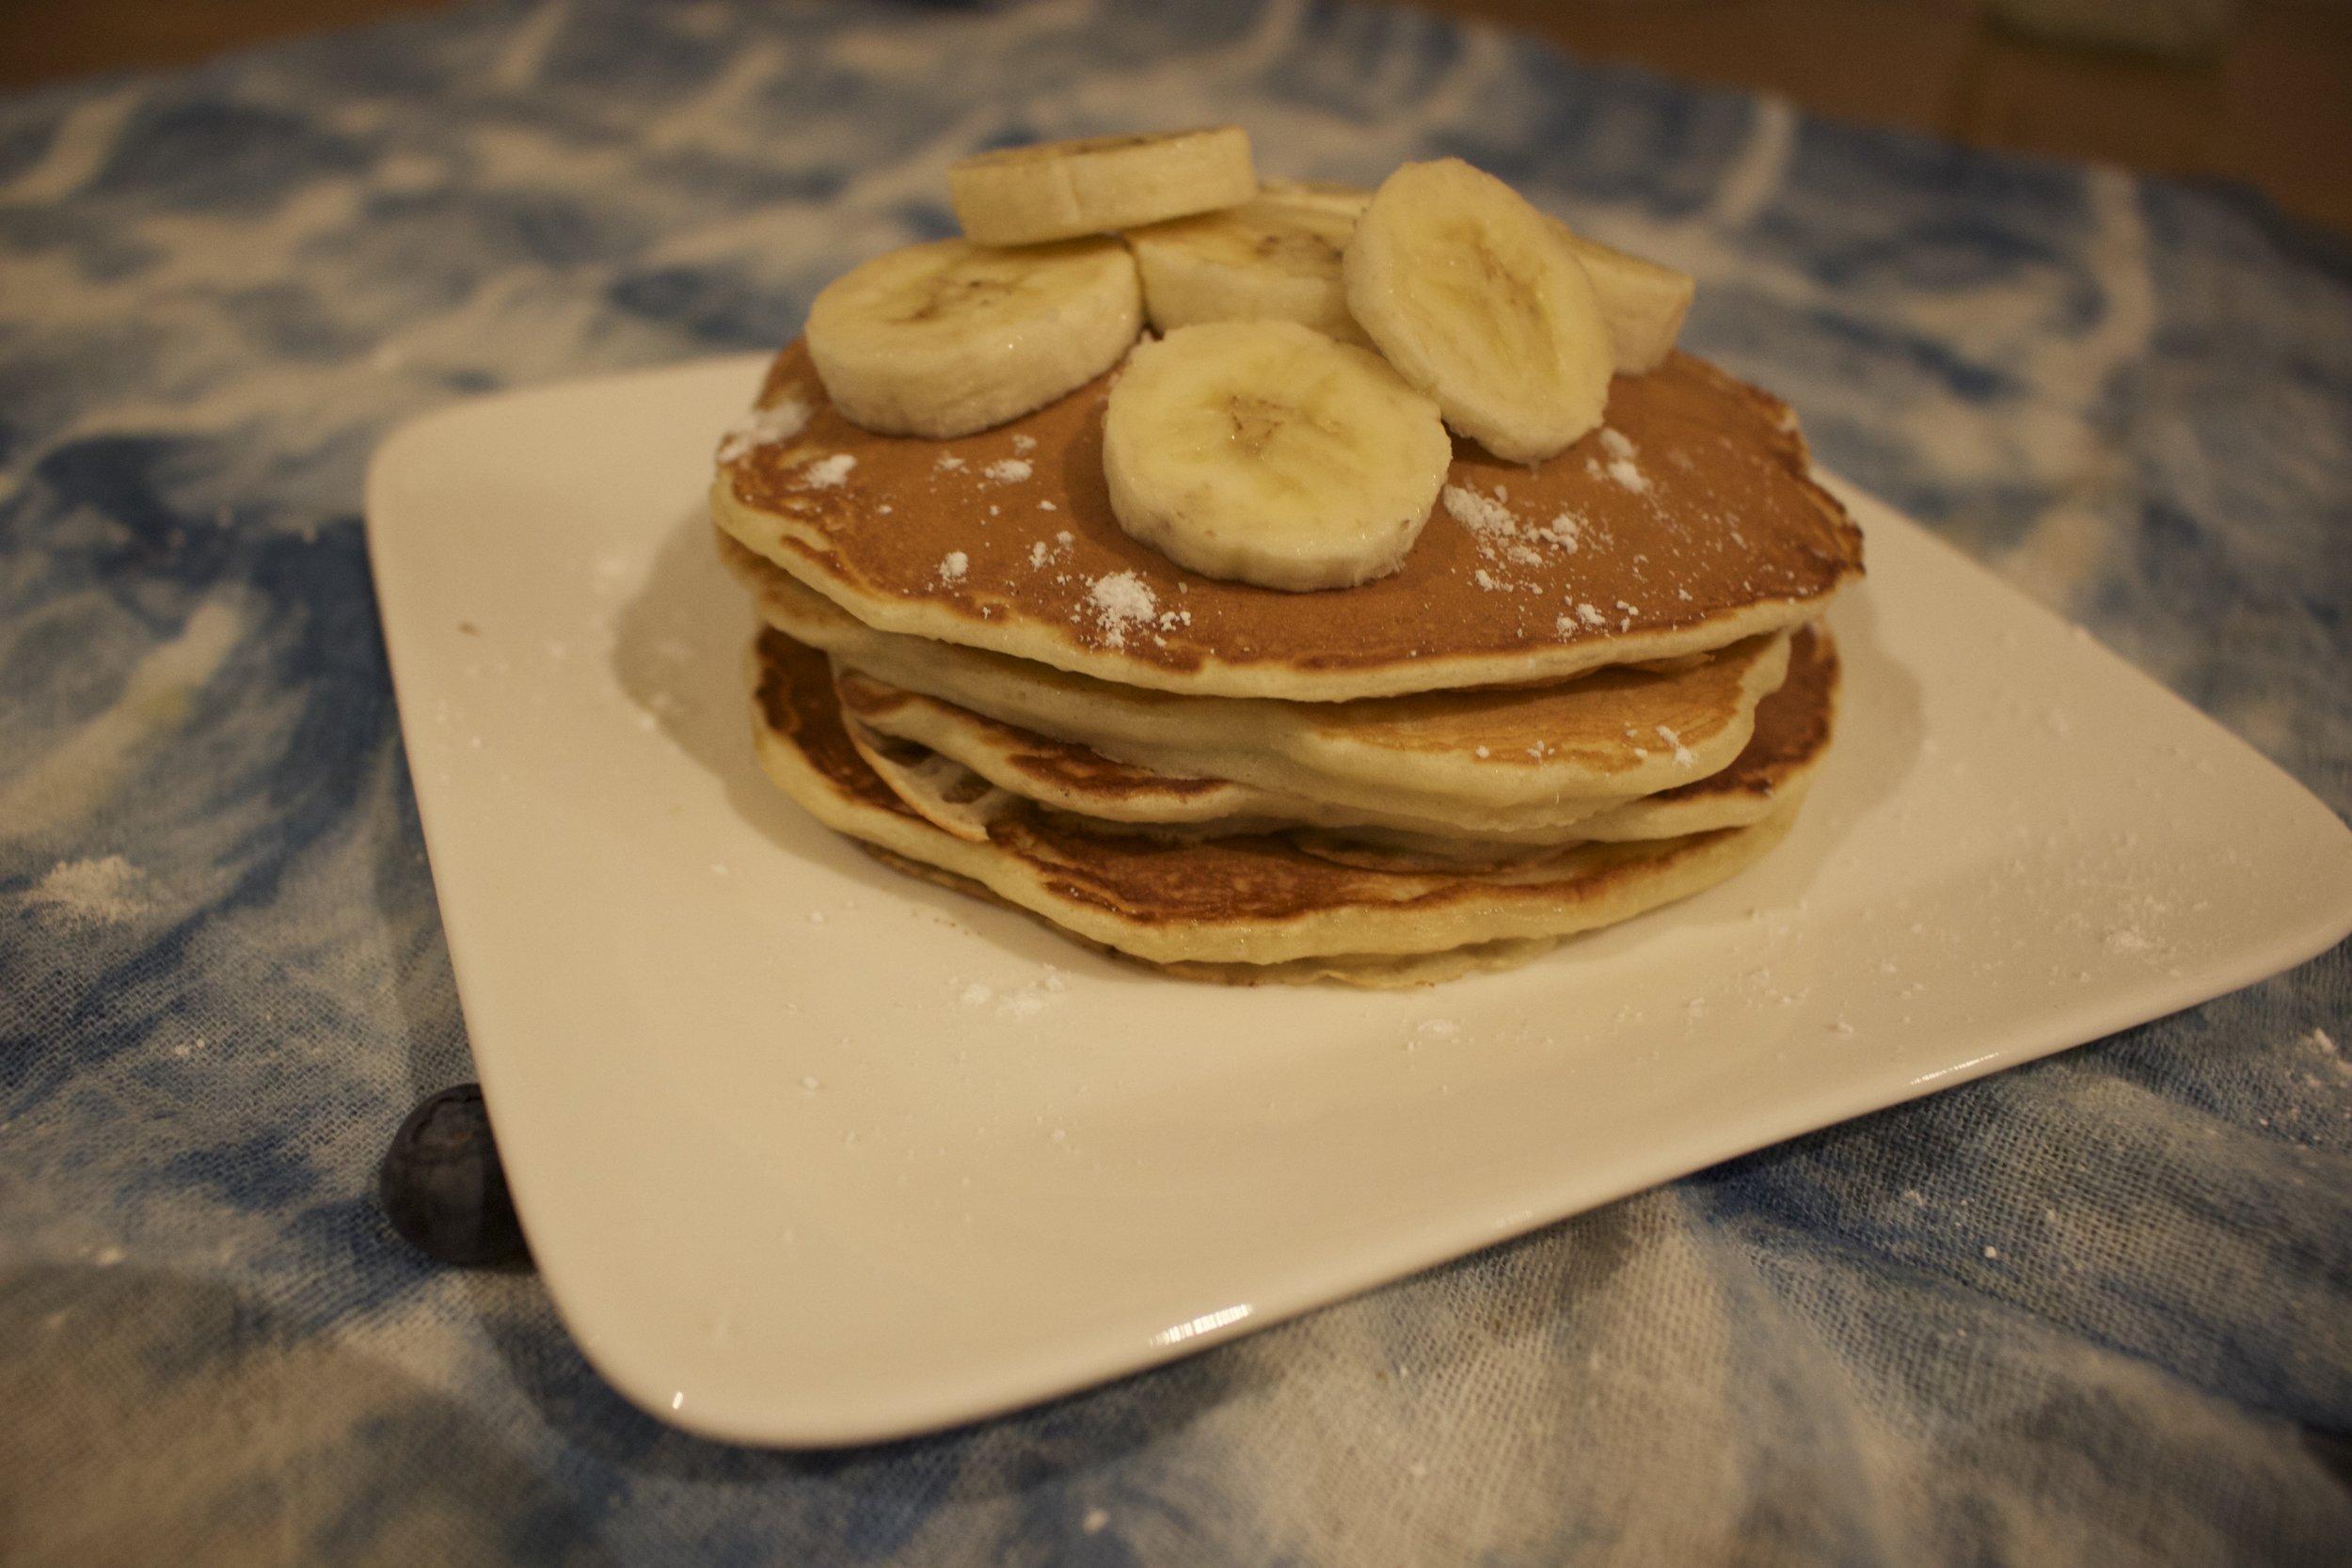 Delicious stack of banana pancakes